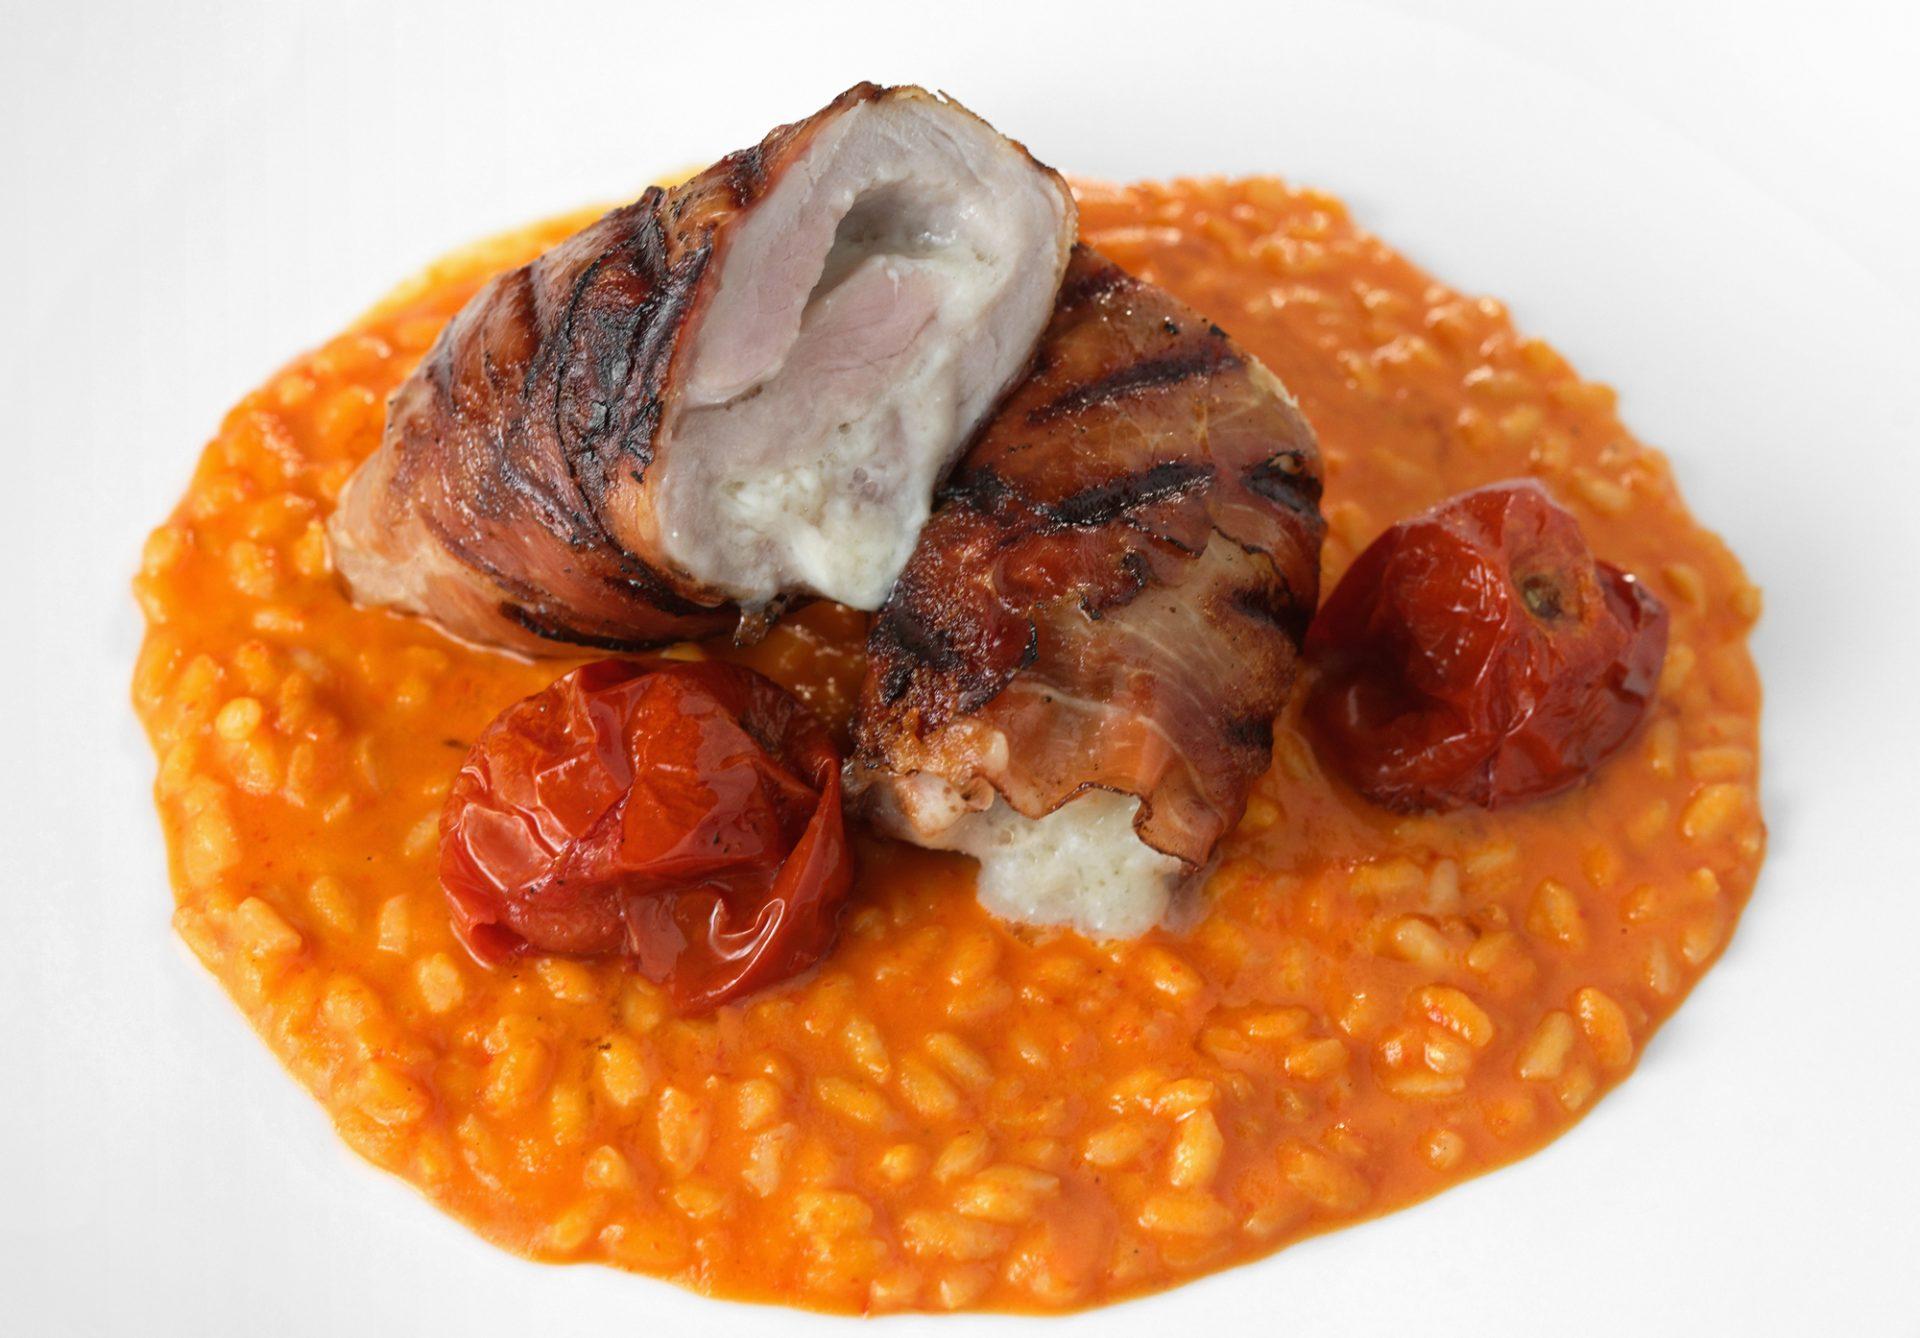 Montenegrin Cuisine - Stuffed Pork Loin